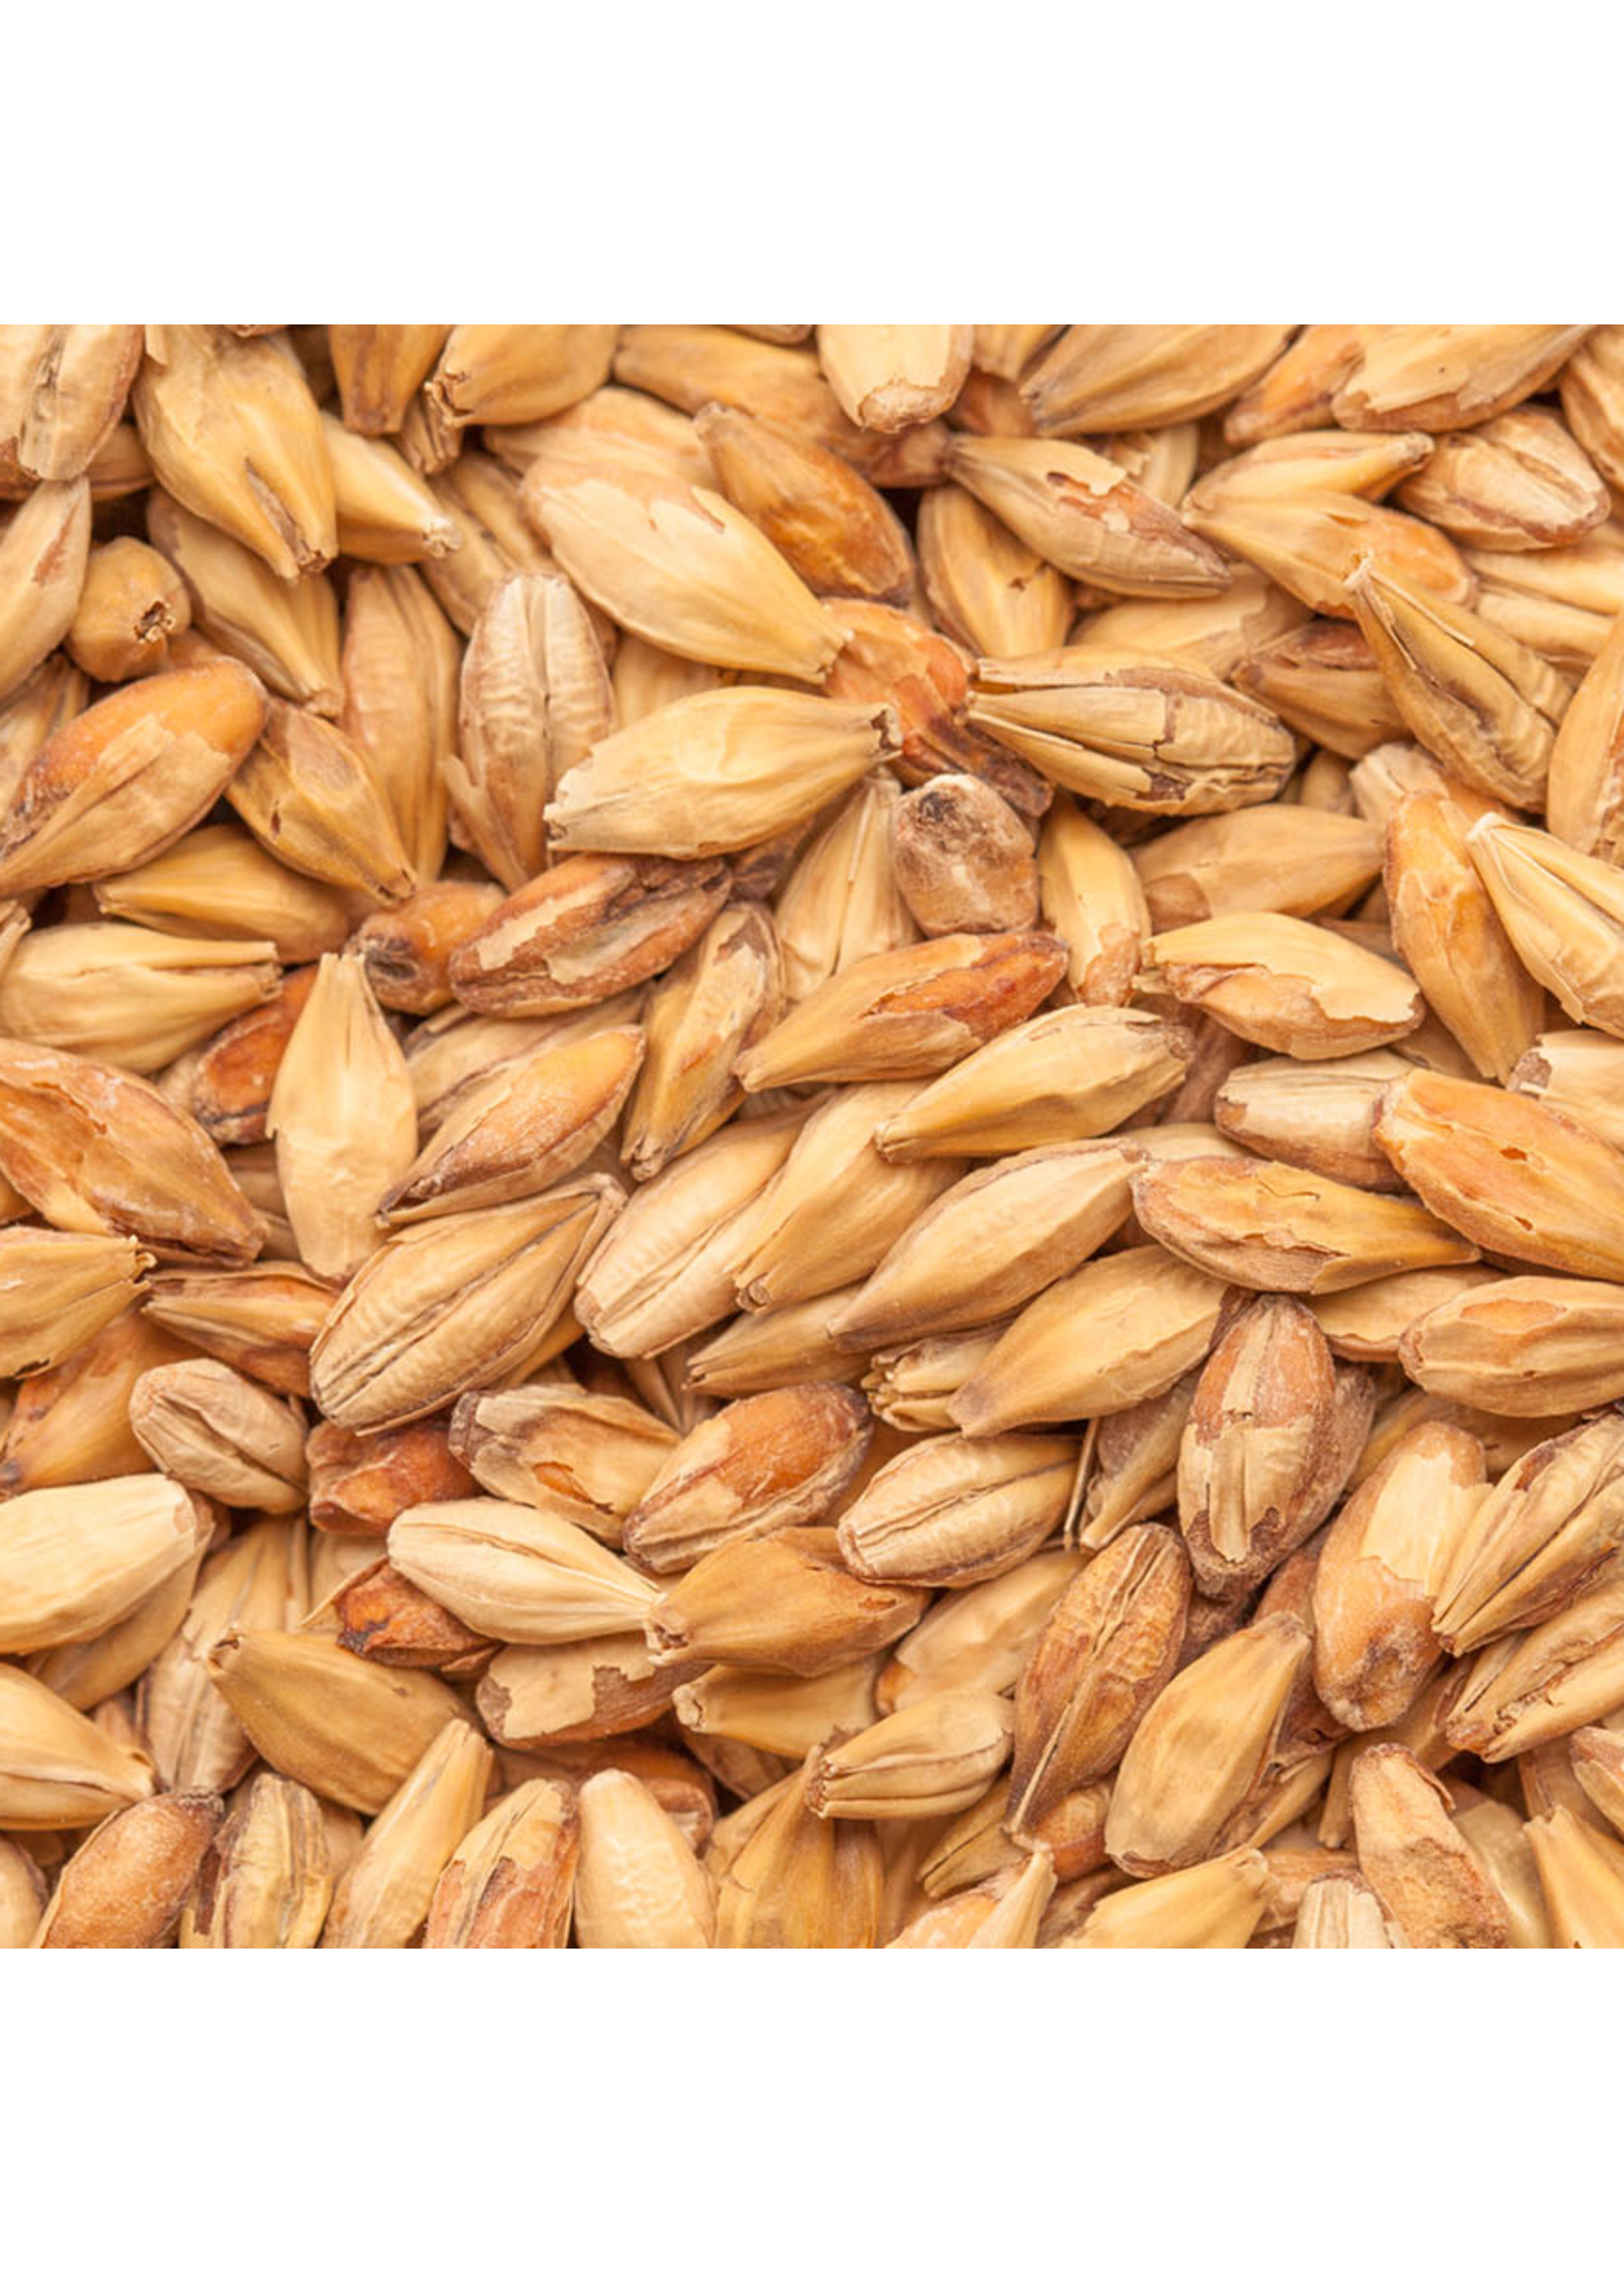 Grain Best Malz Caramel Aromatic Malt - F5 - 1 LB